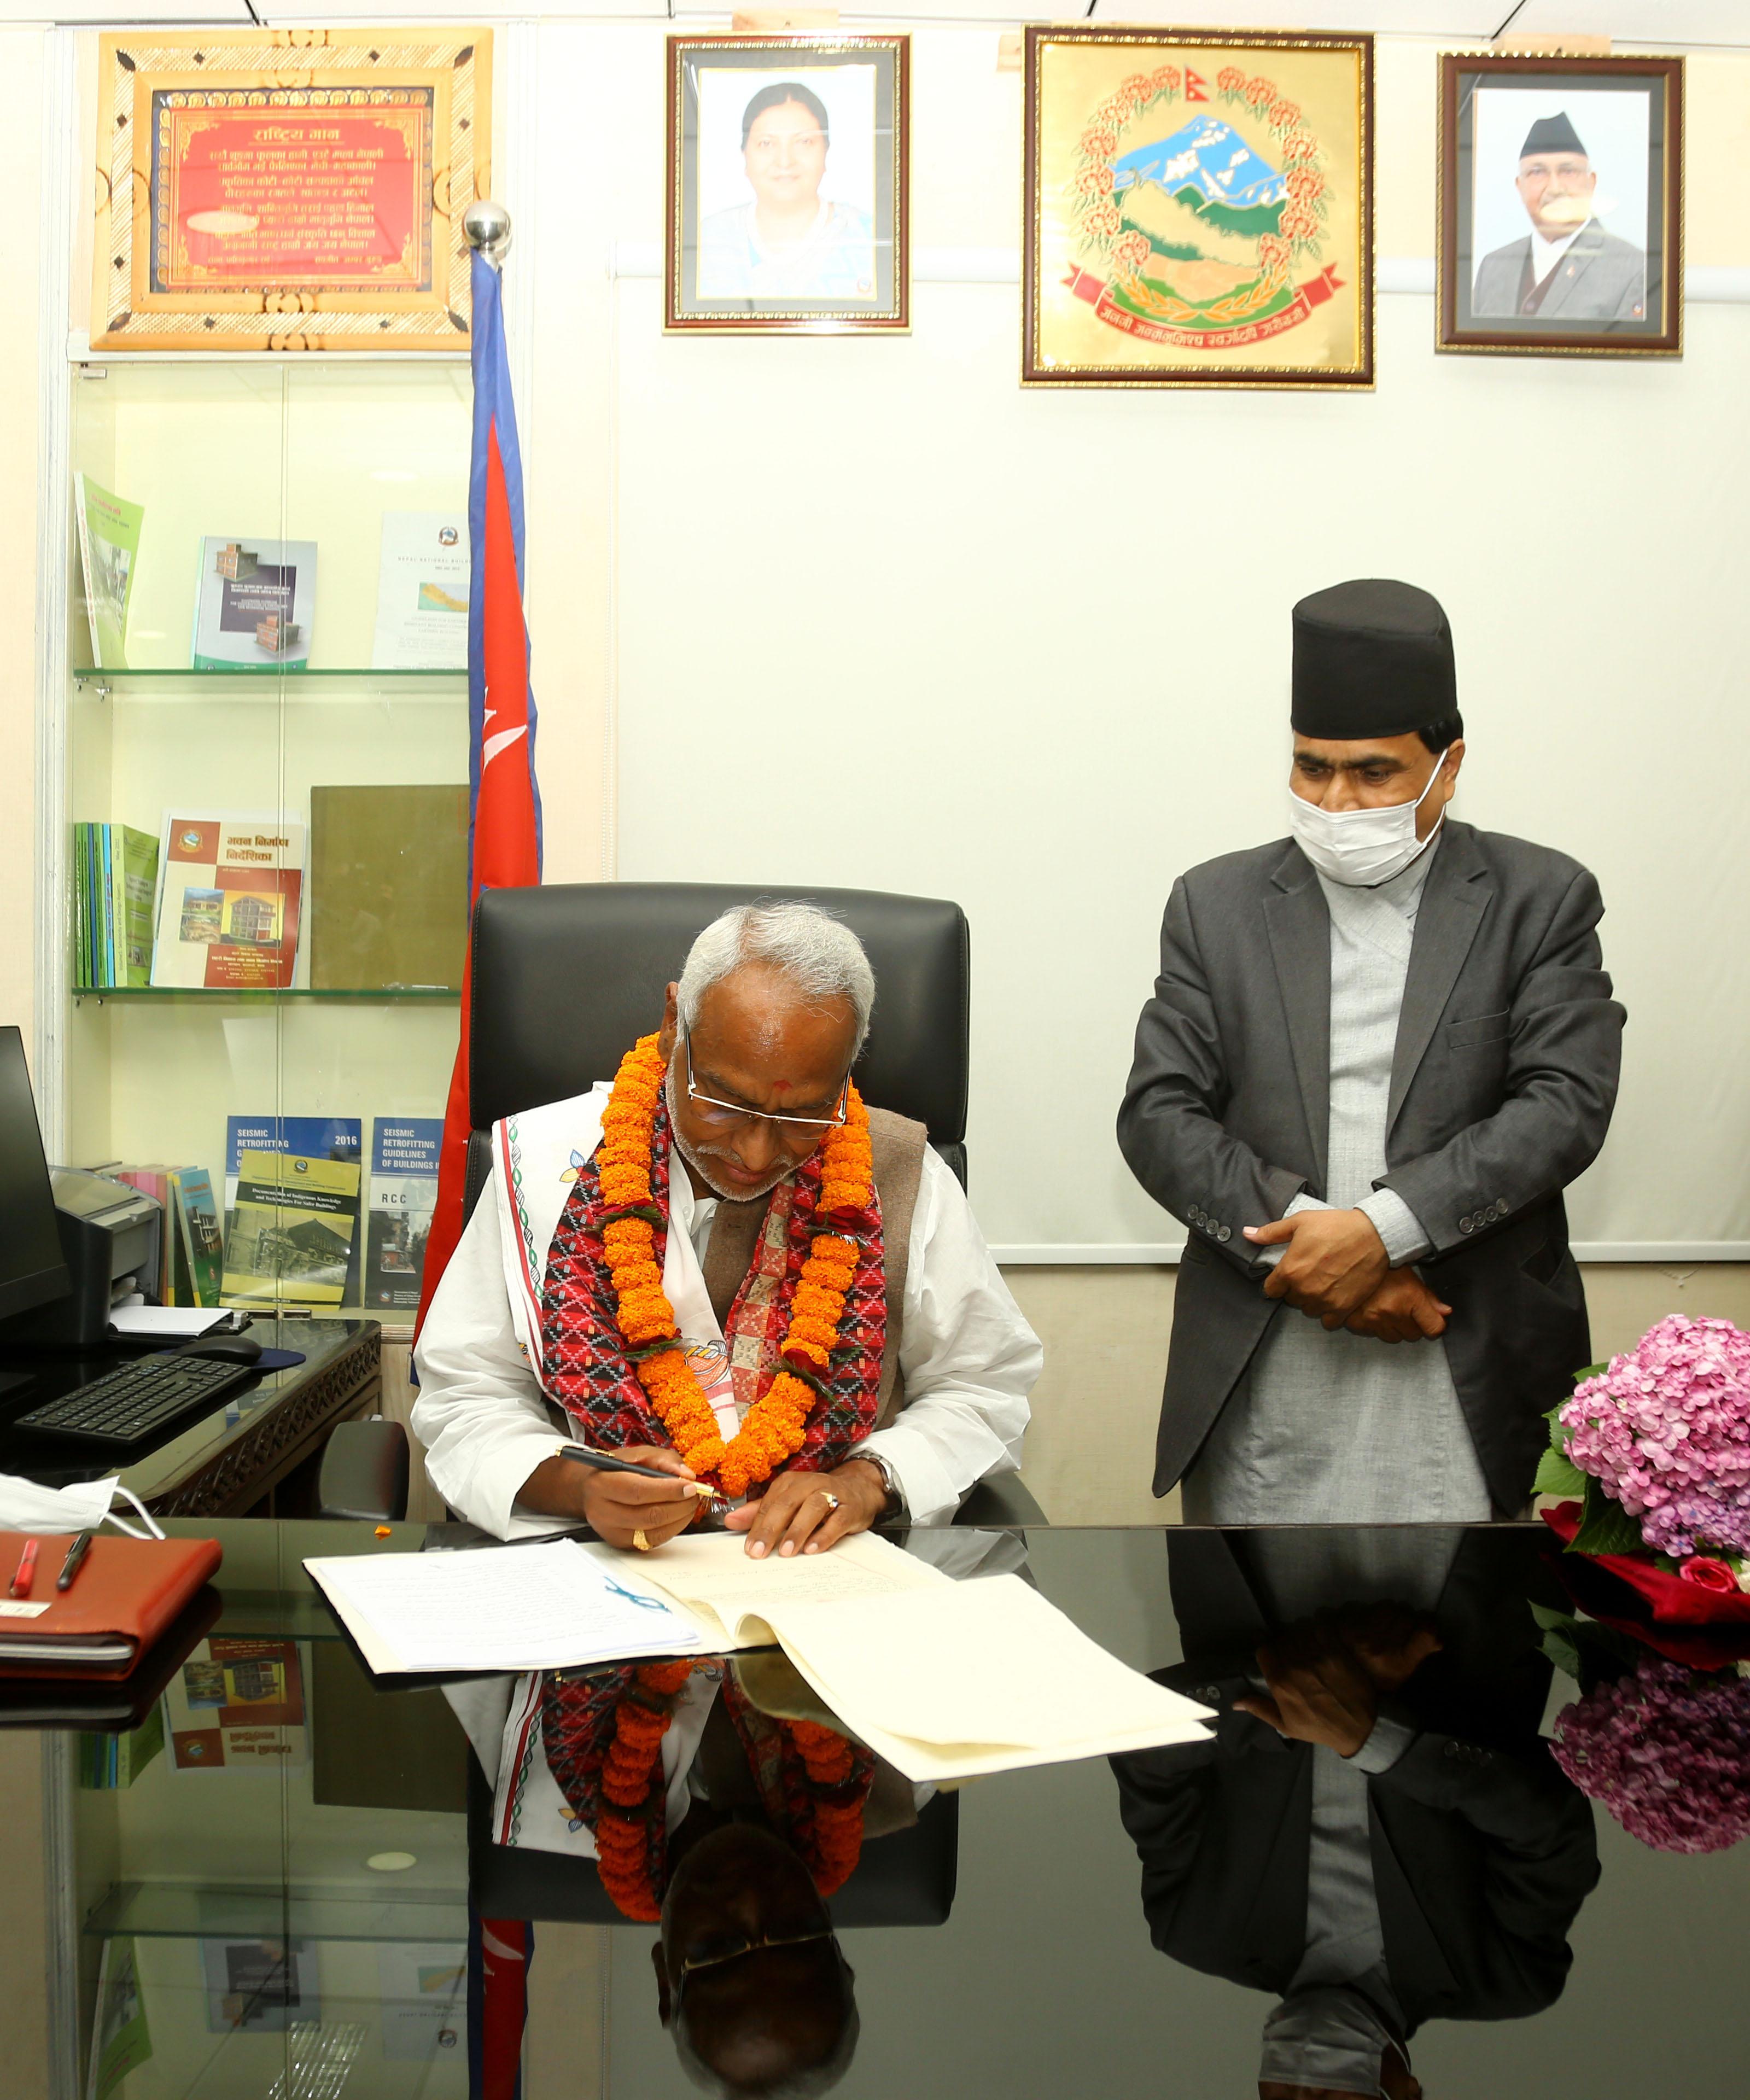 Senior JSP leader Rajendra Mahato assumes officer of Deputy Prime Minister and Minister for Urban Development